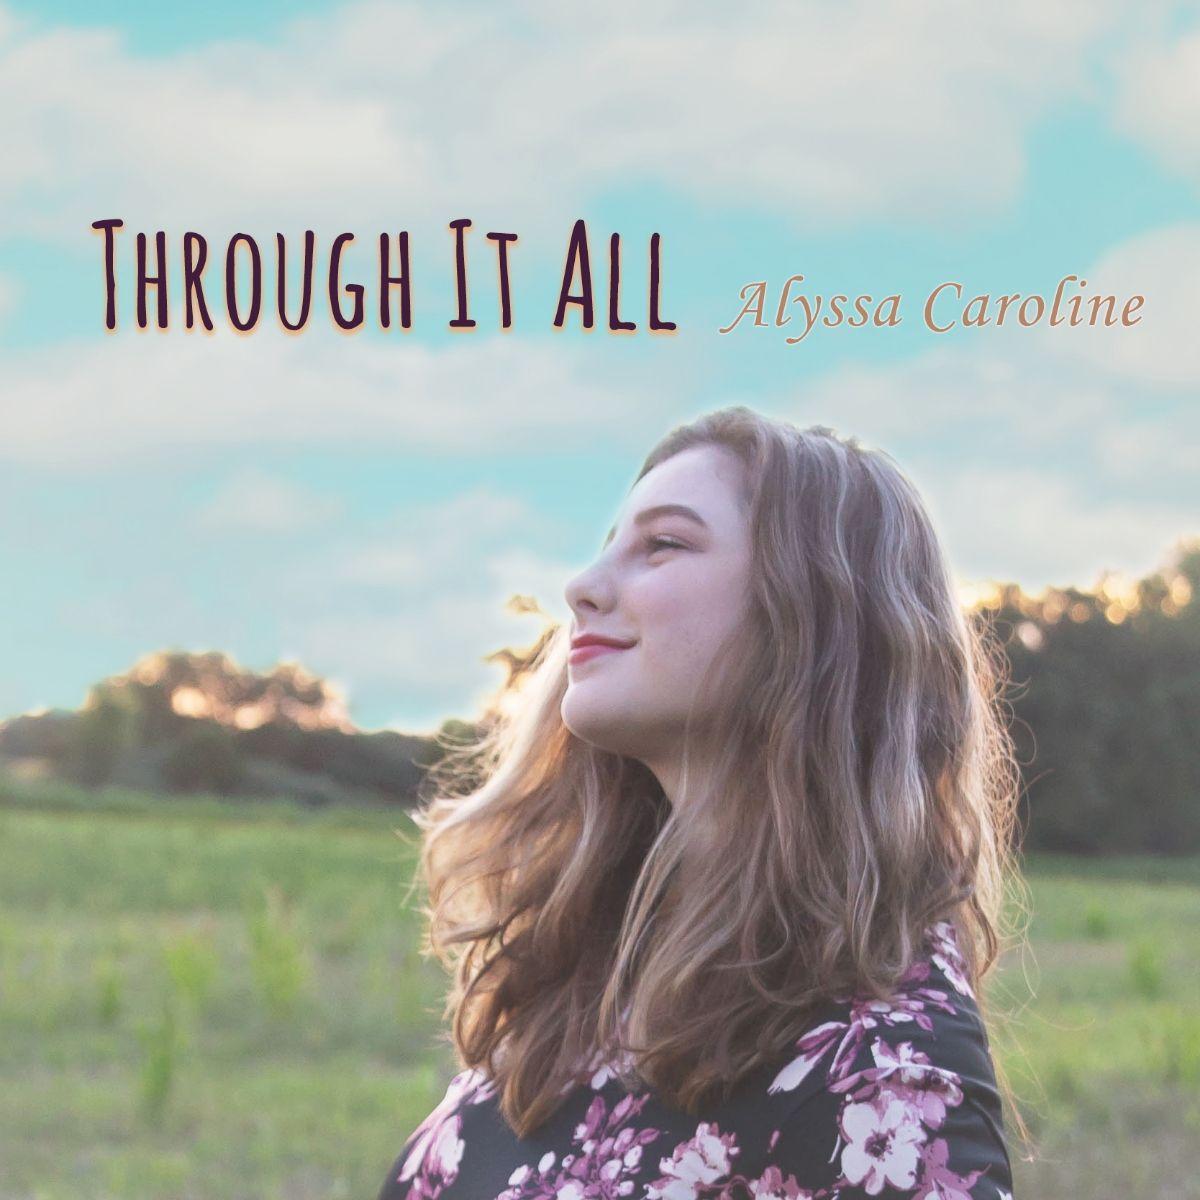 Through it All – Alyssa Caroline